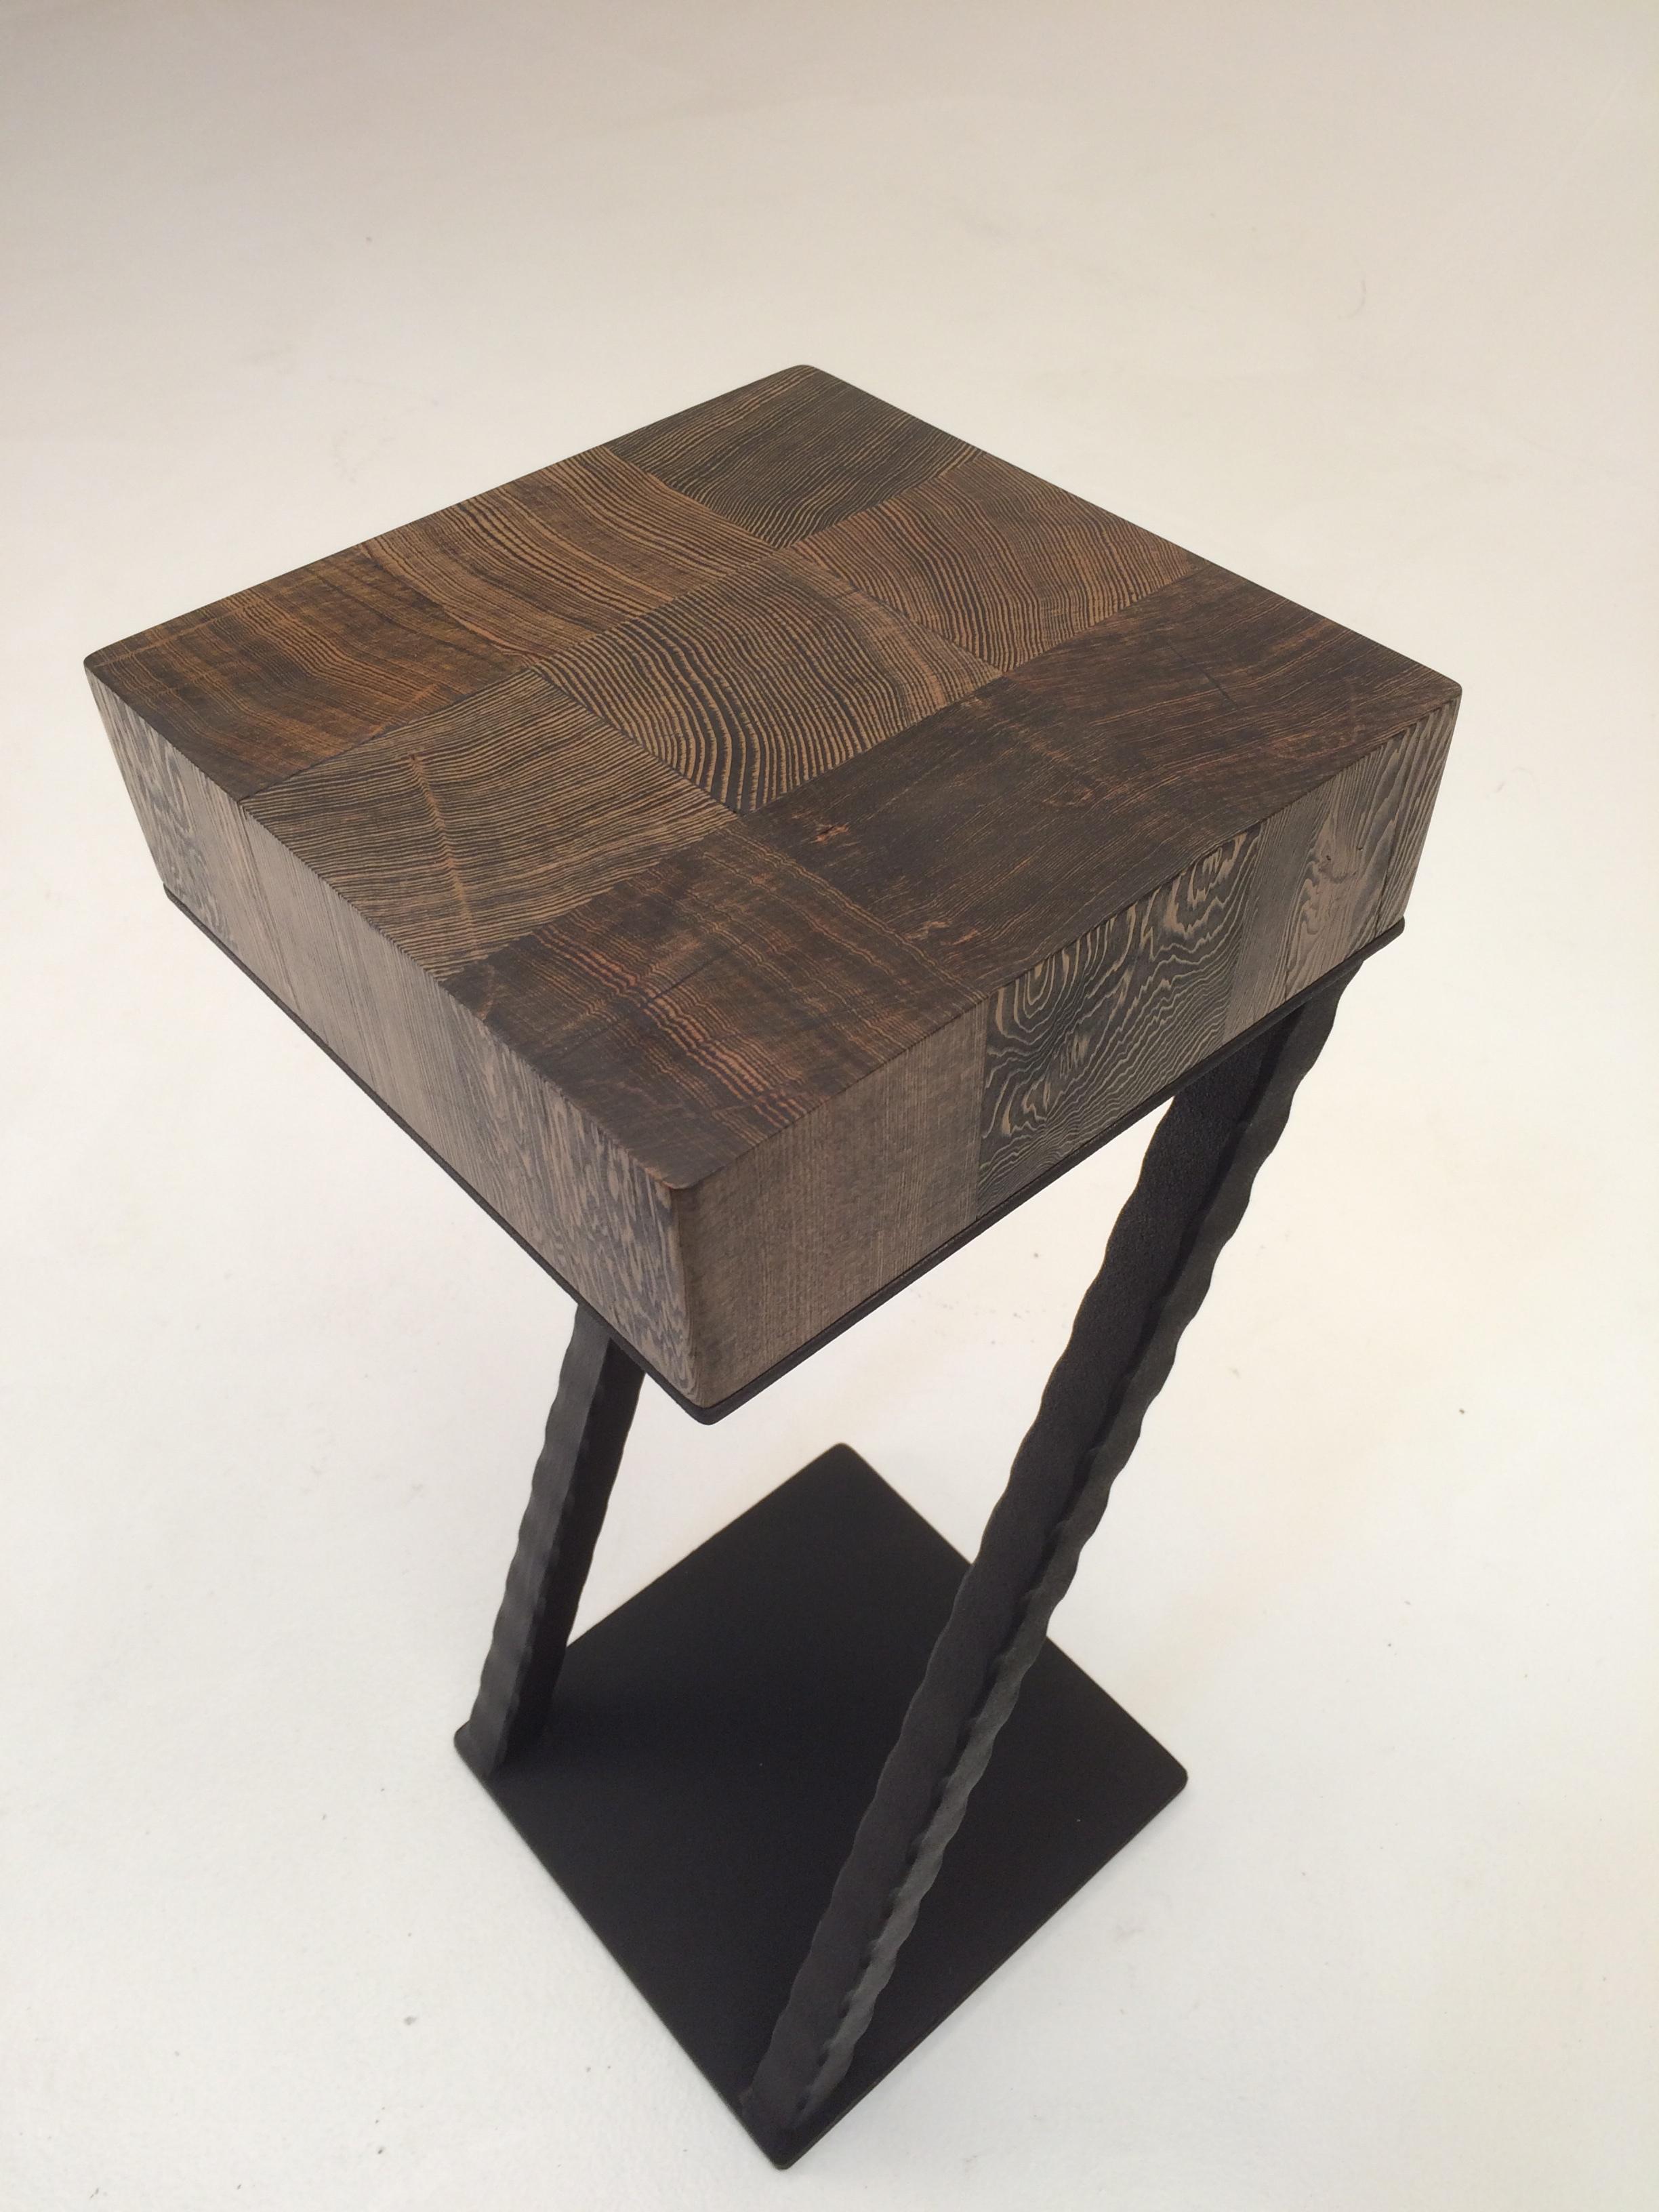 End-grain Wood Drink Table